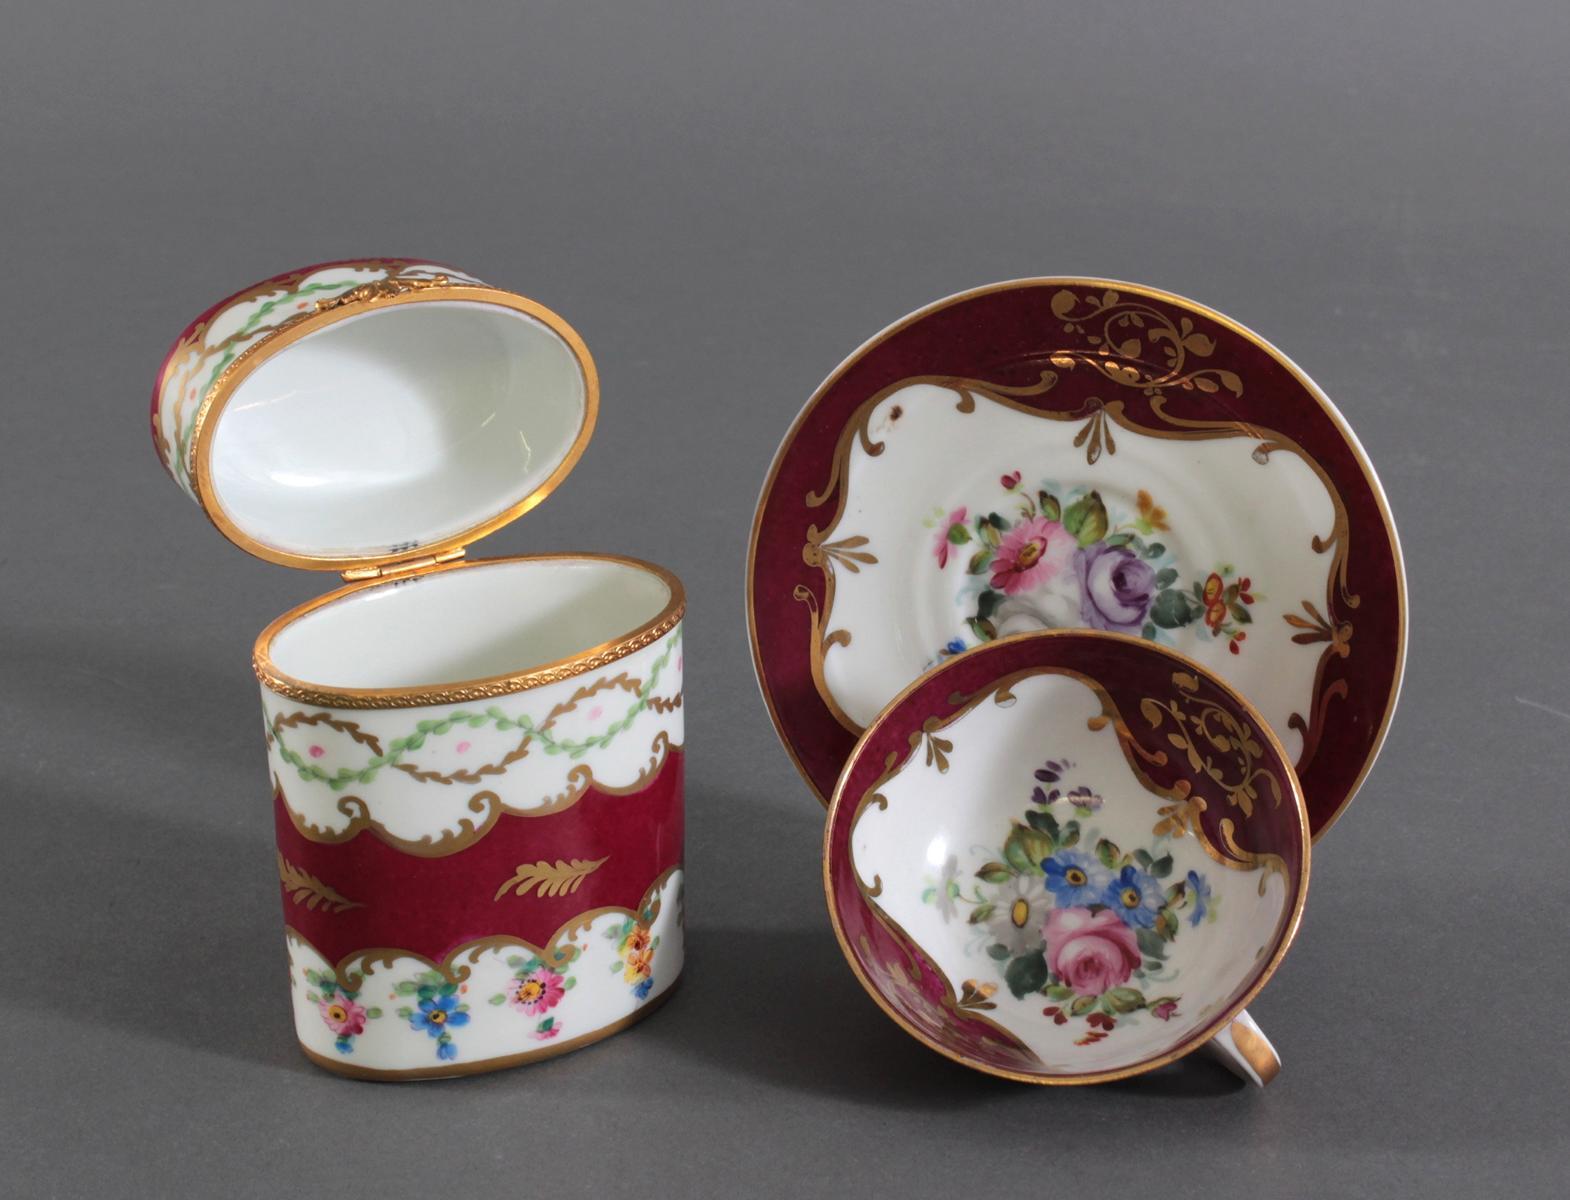 Drei Teile Porzellan, vermutlich Paris, Edmé Samson, Ende 19. Jh.-3